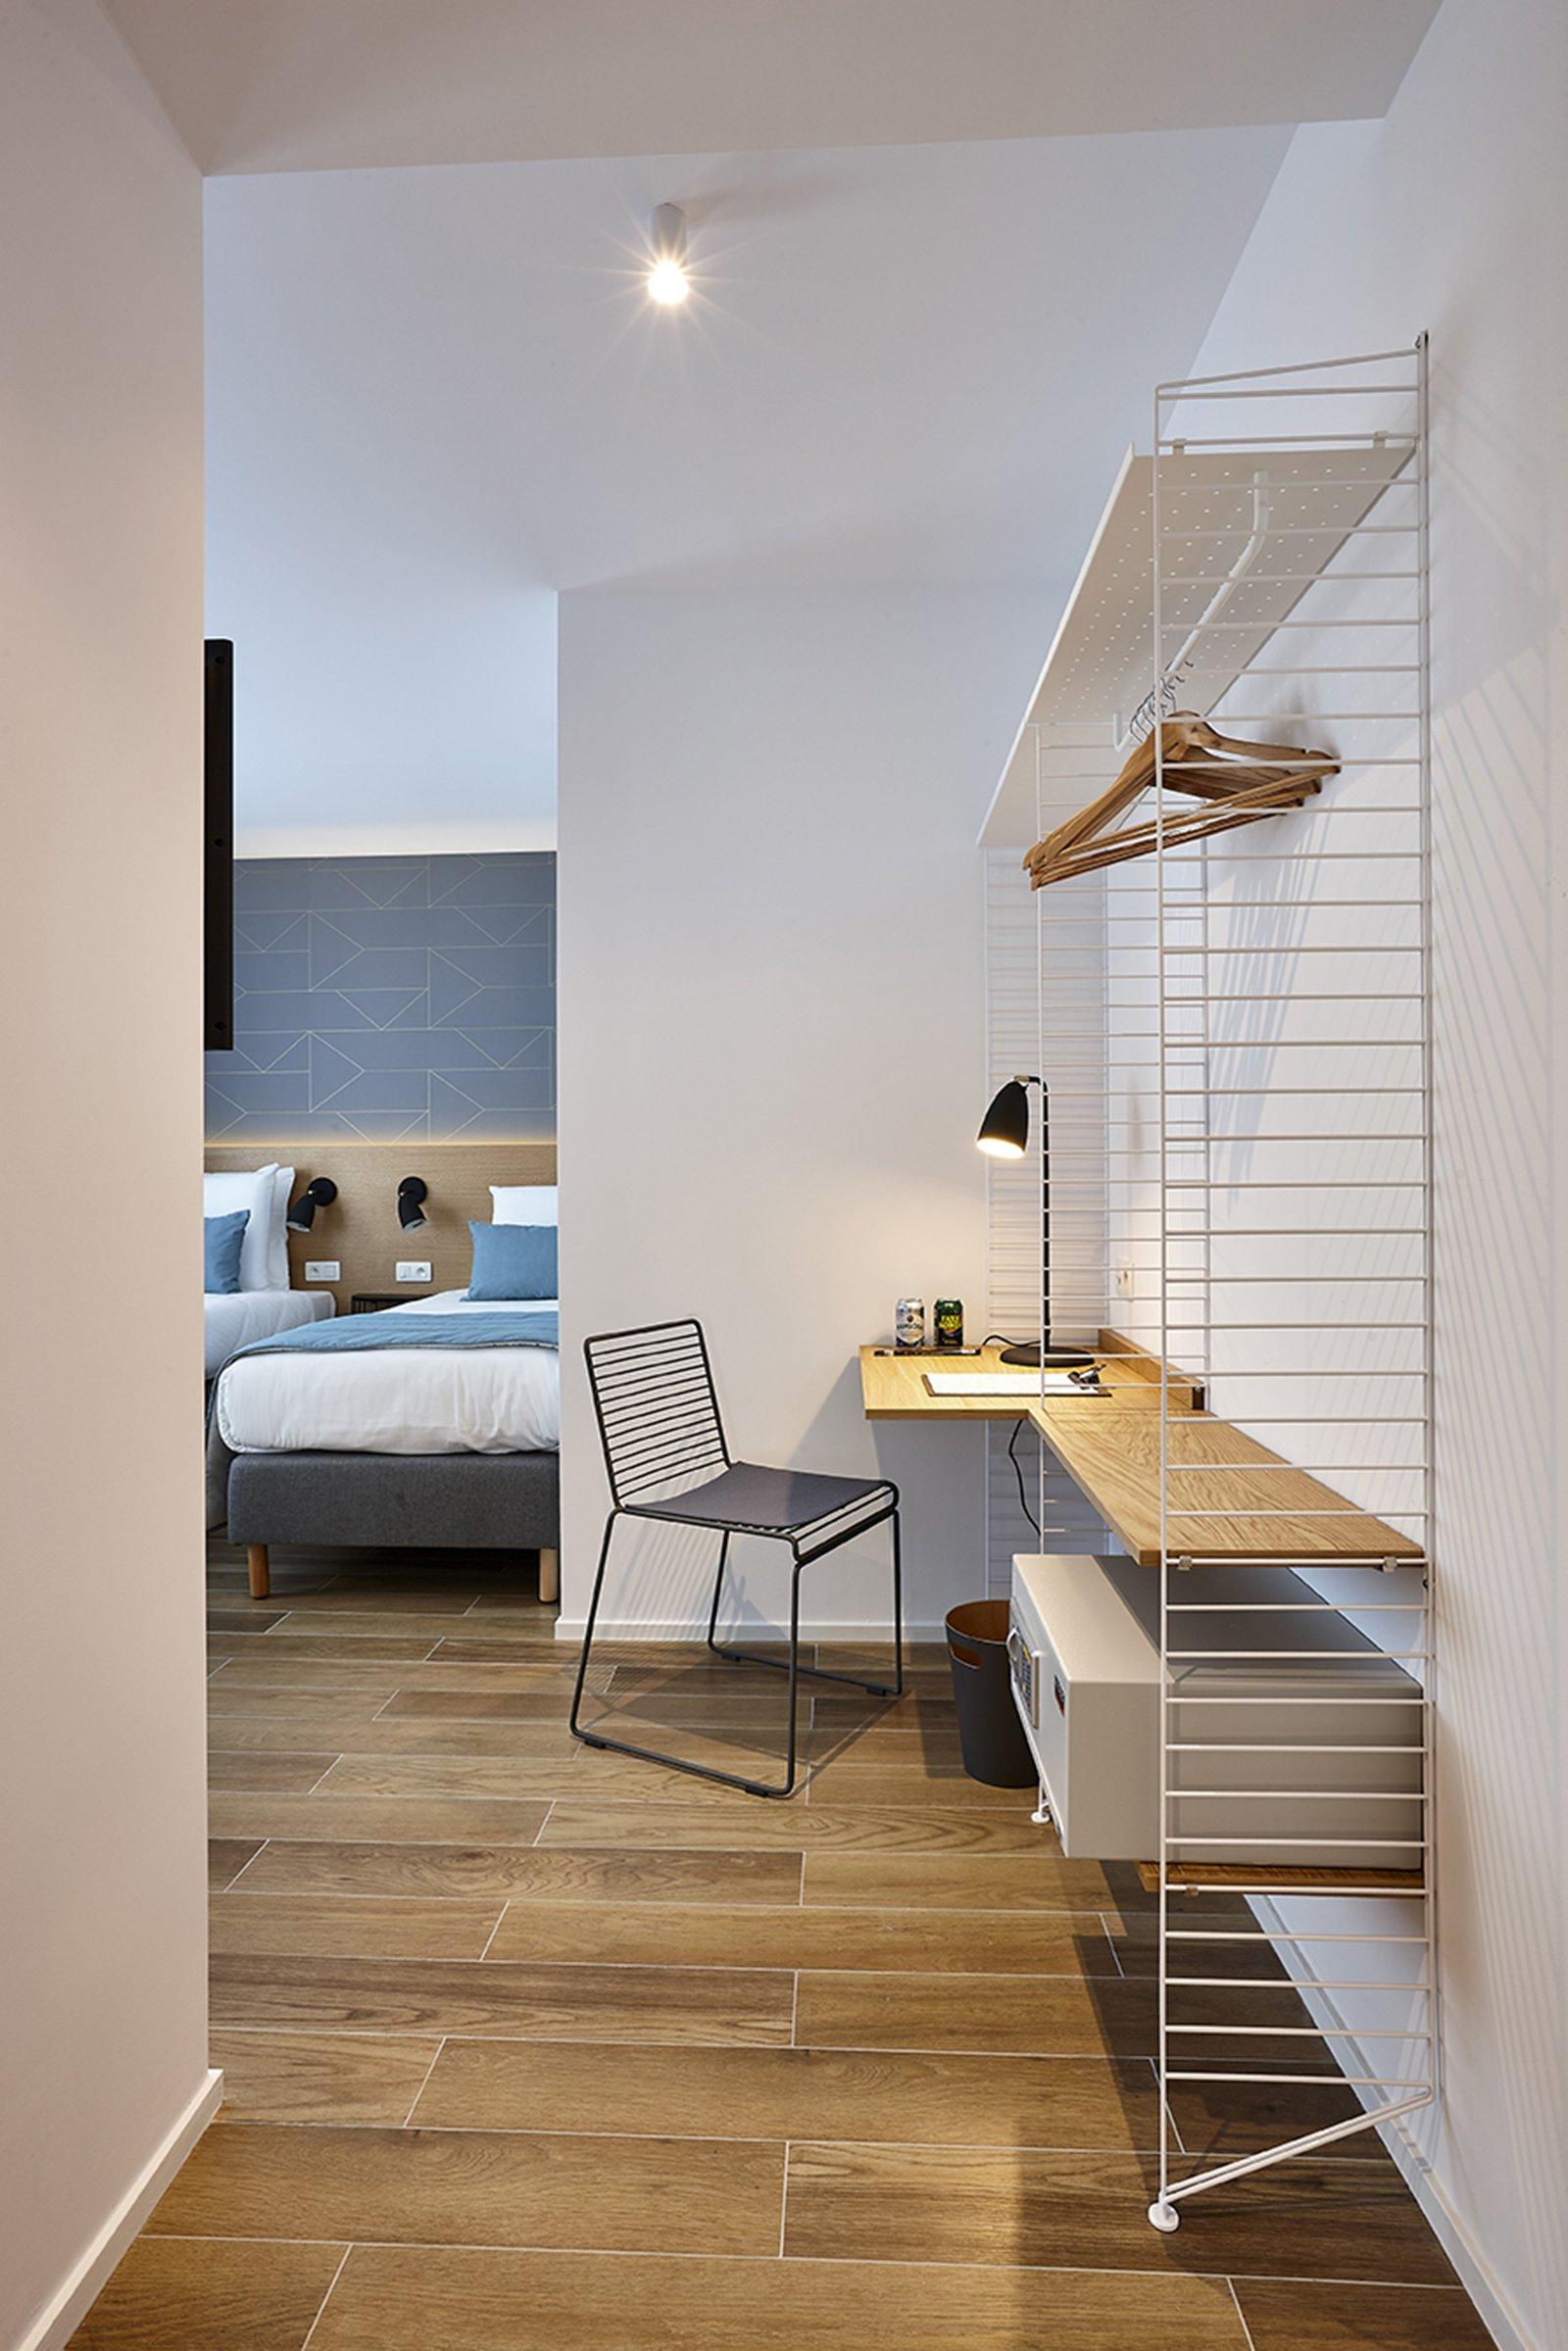 hygge hotel brussels belgium desk